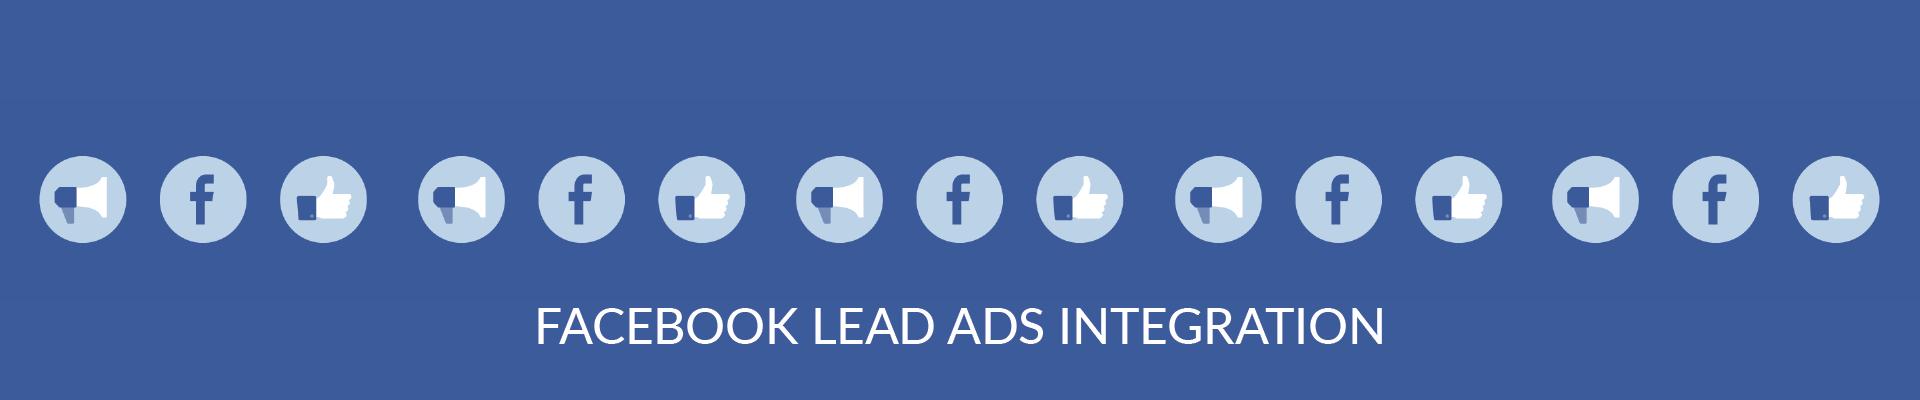 Facebook lead ads element